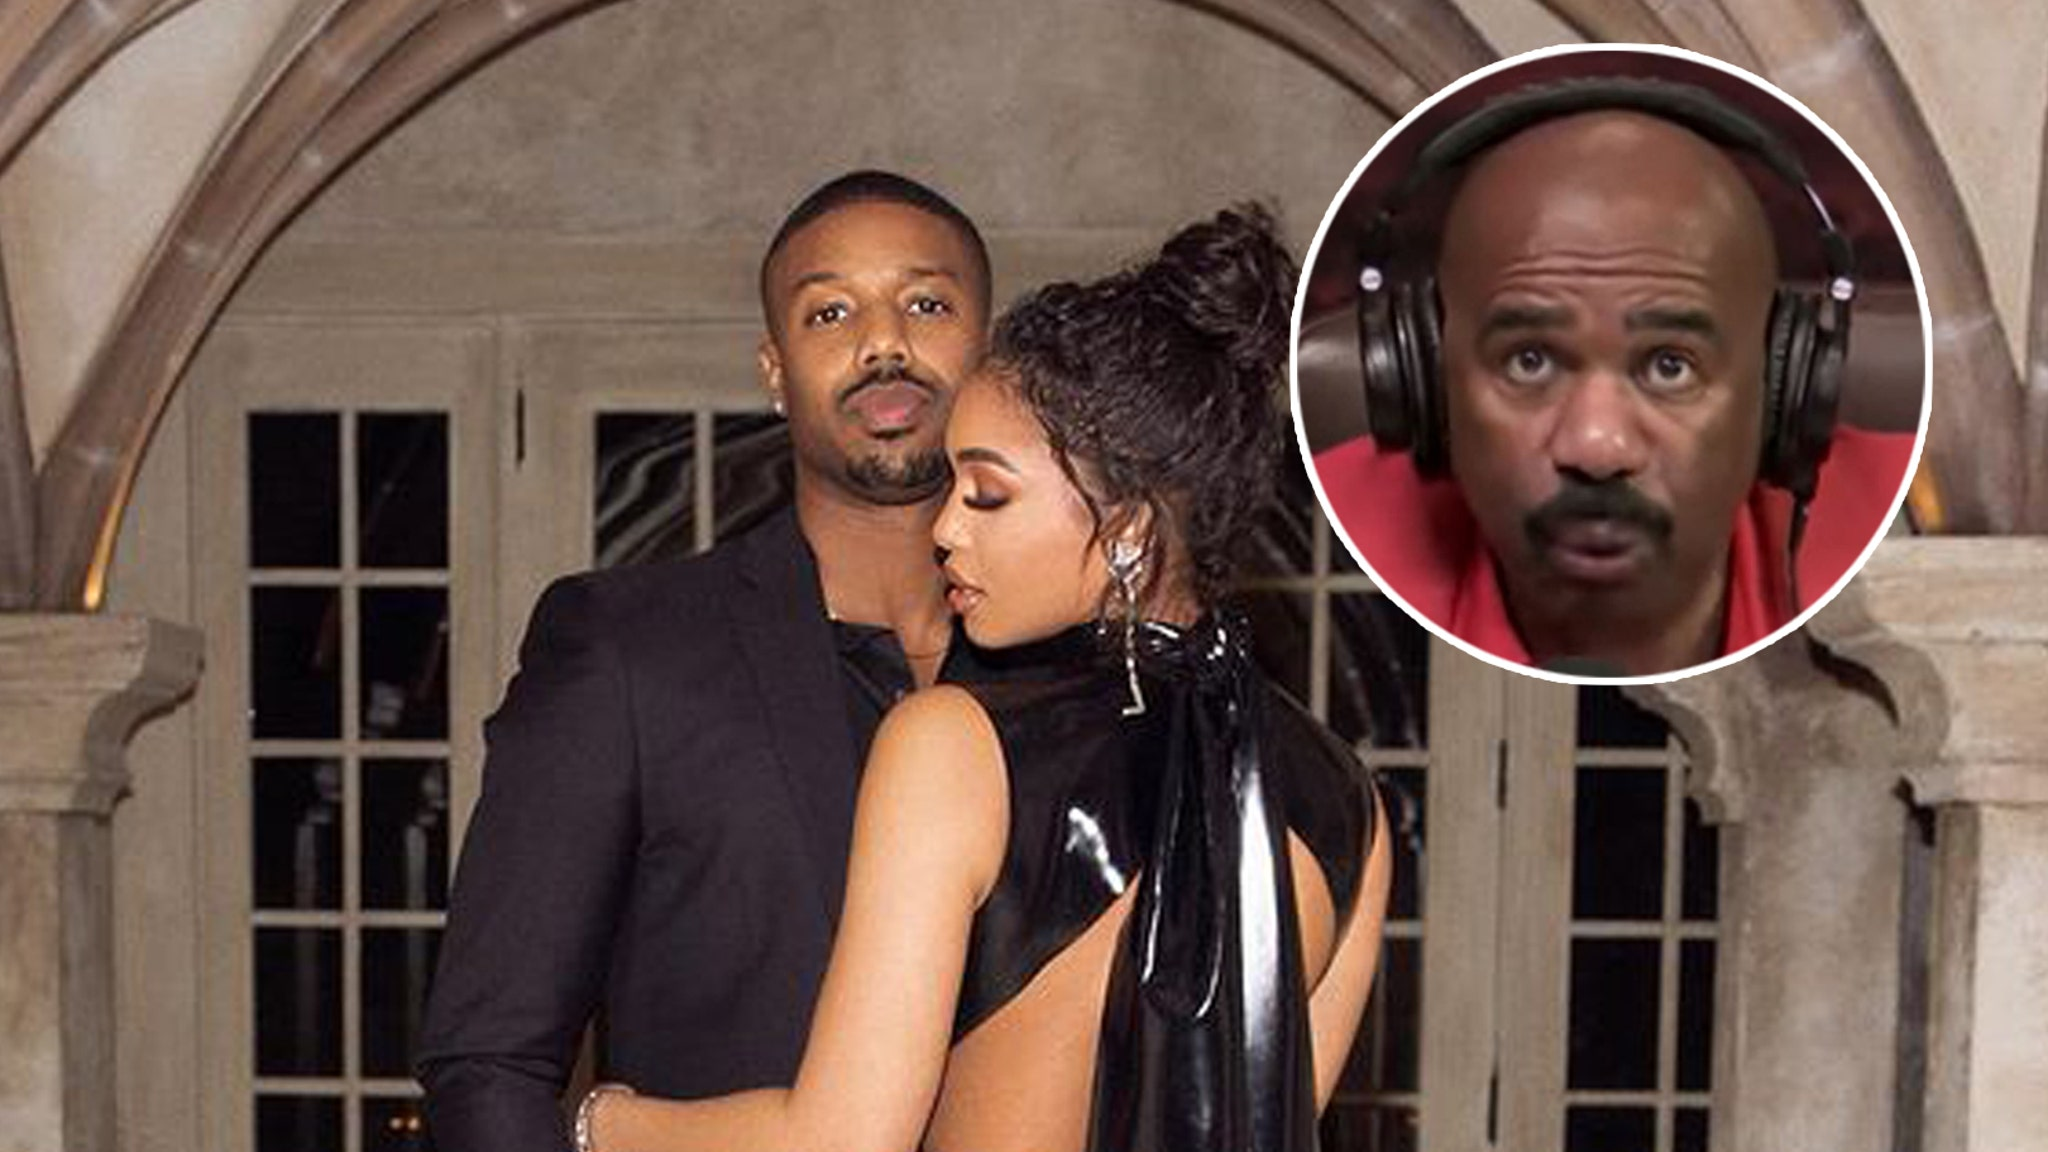 Steve Harvey Isn't That Impressed by His Daughter's Loris Boyfriend Michael B. Jordan